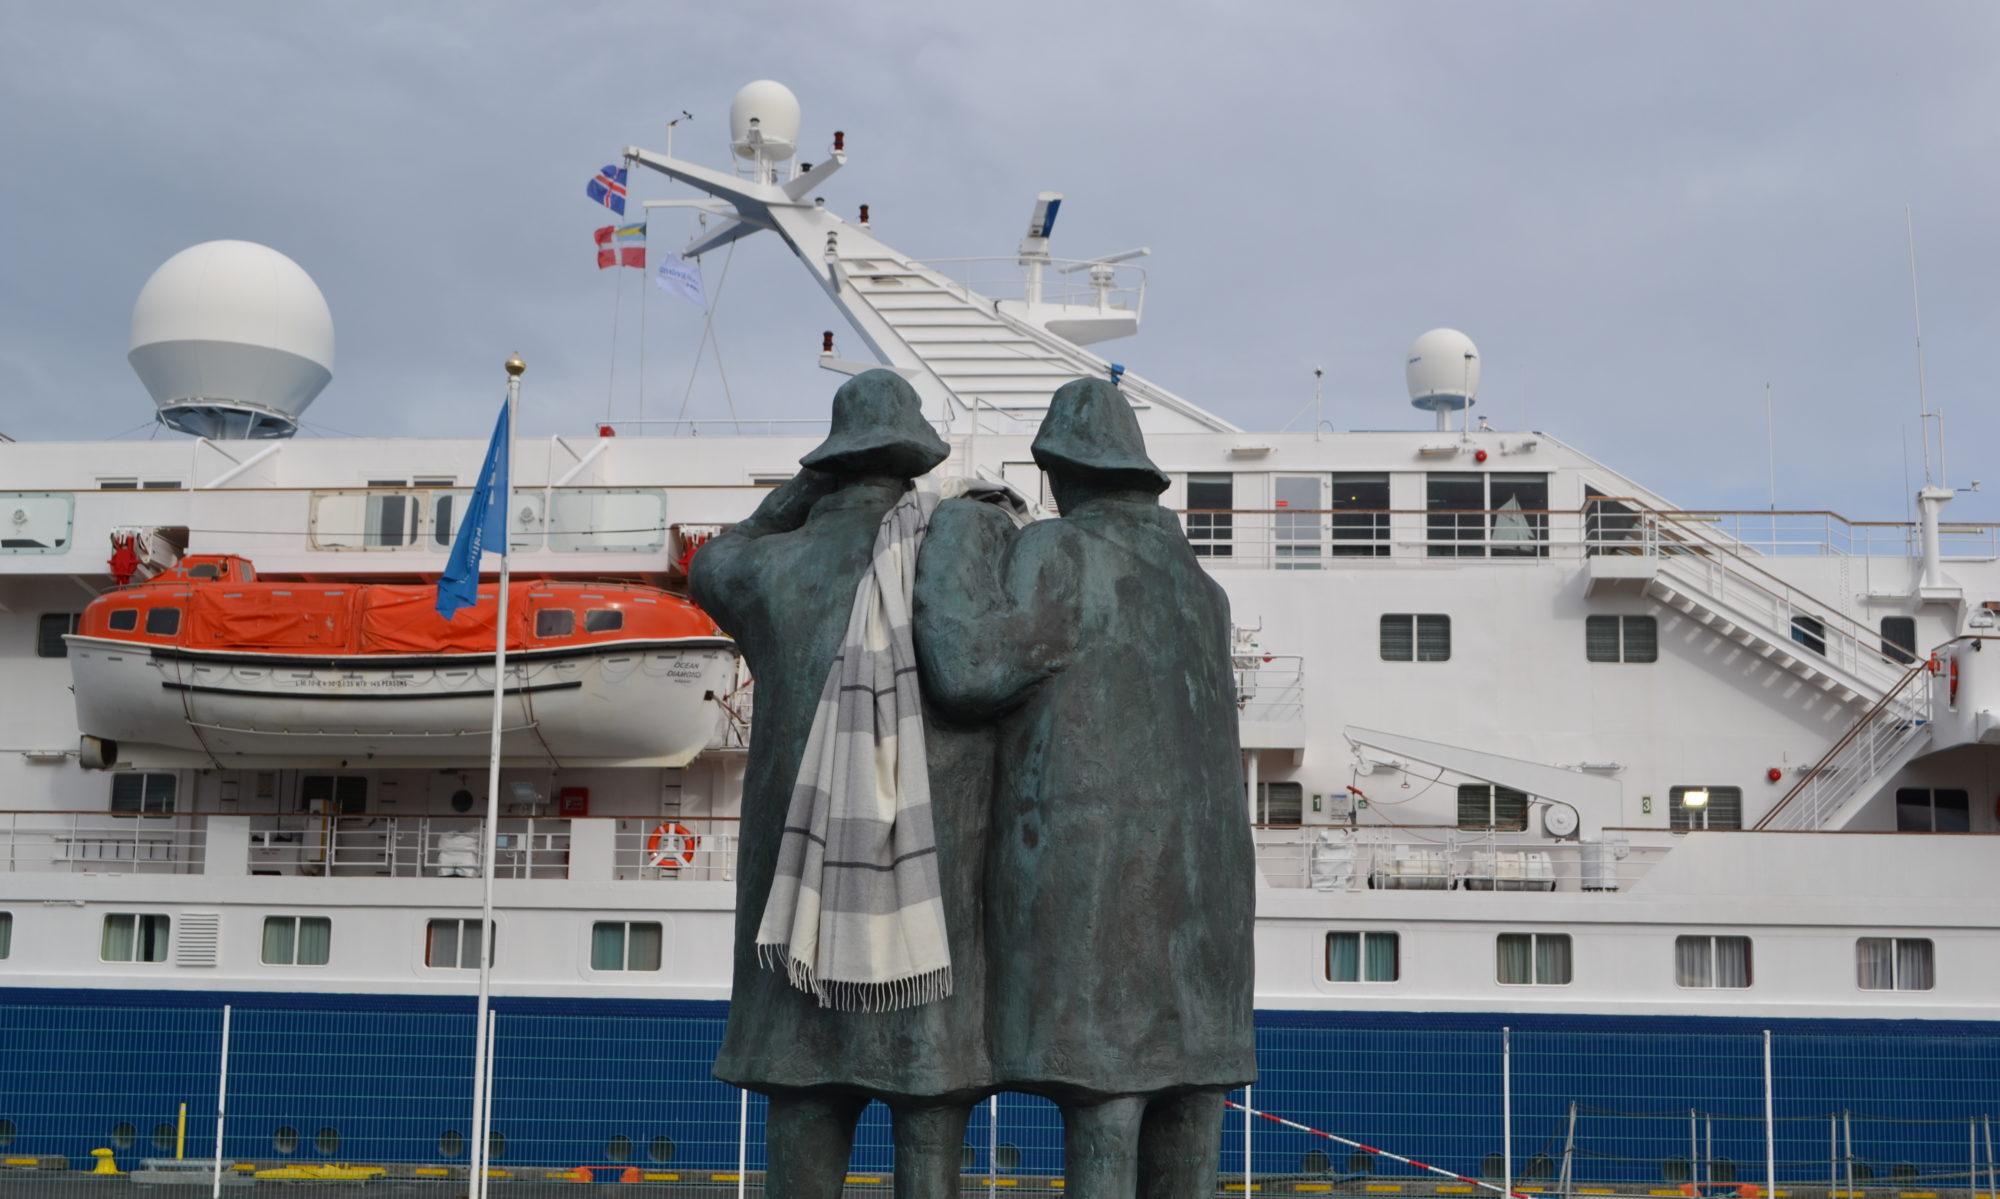 MJÚK ICELAND